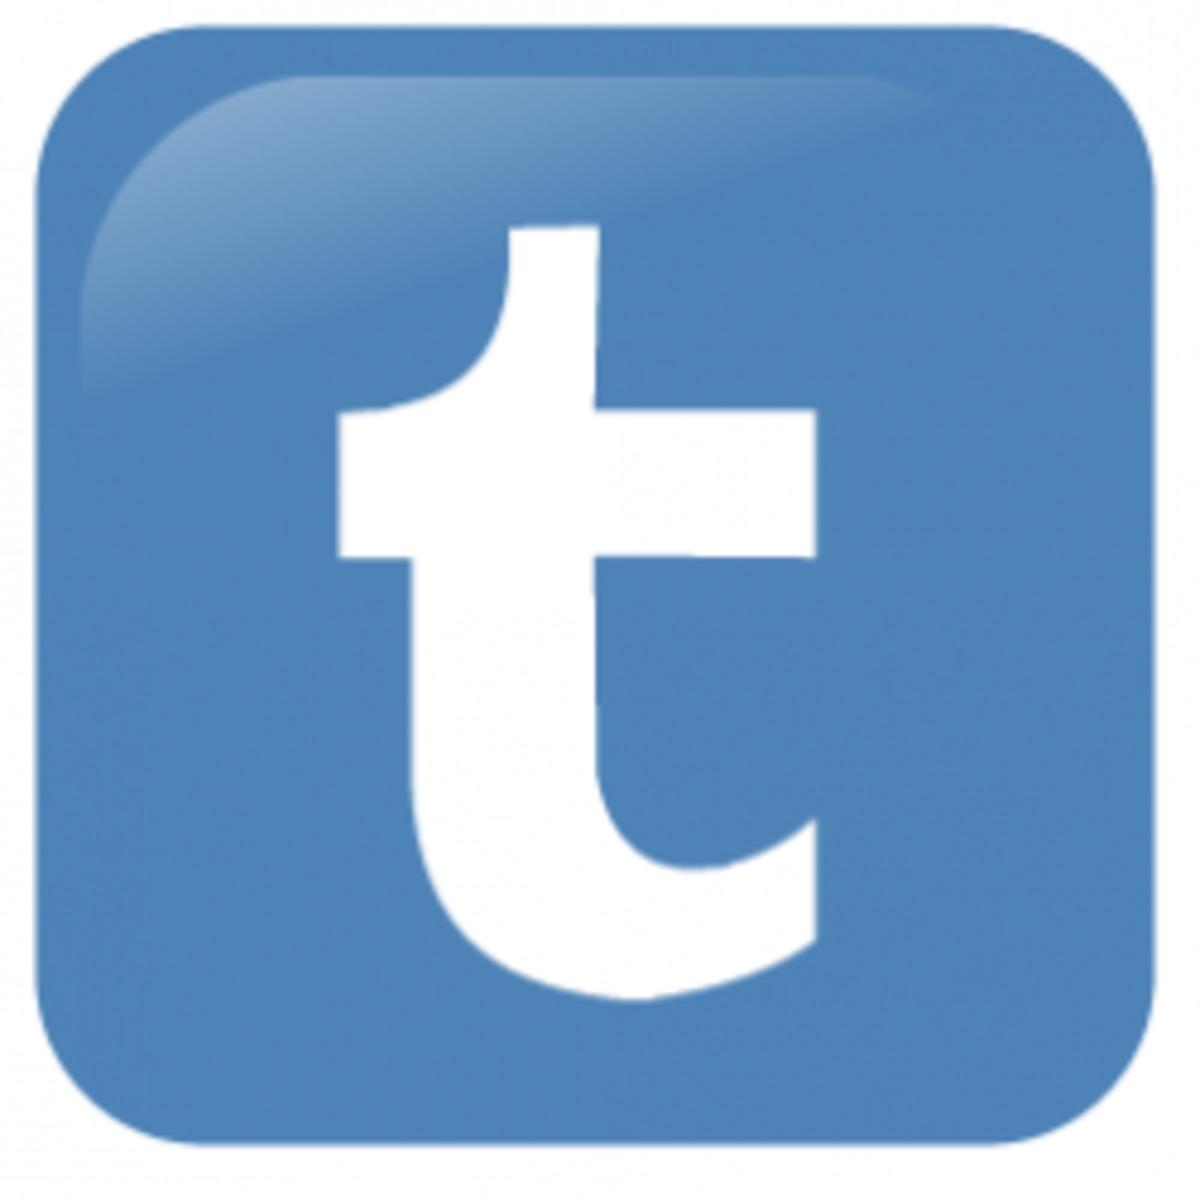 8 Sites Like Tumblr - Free Blogging Websites